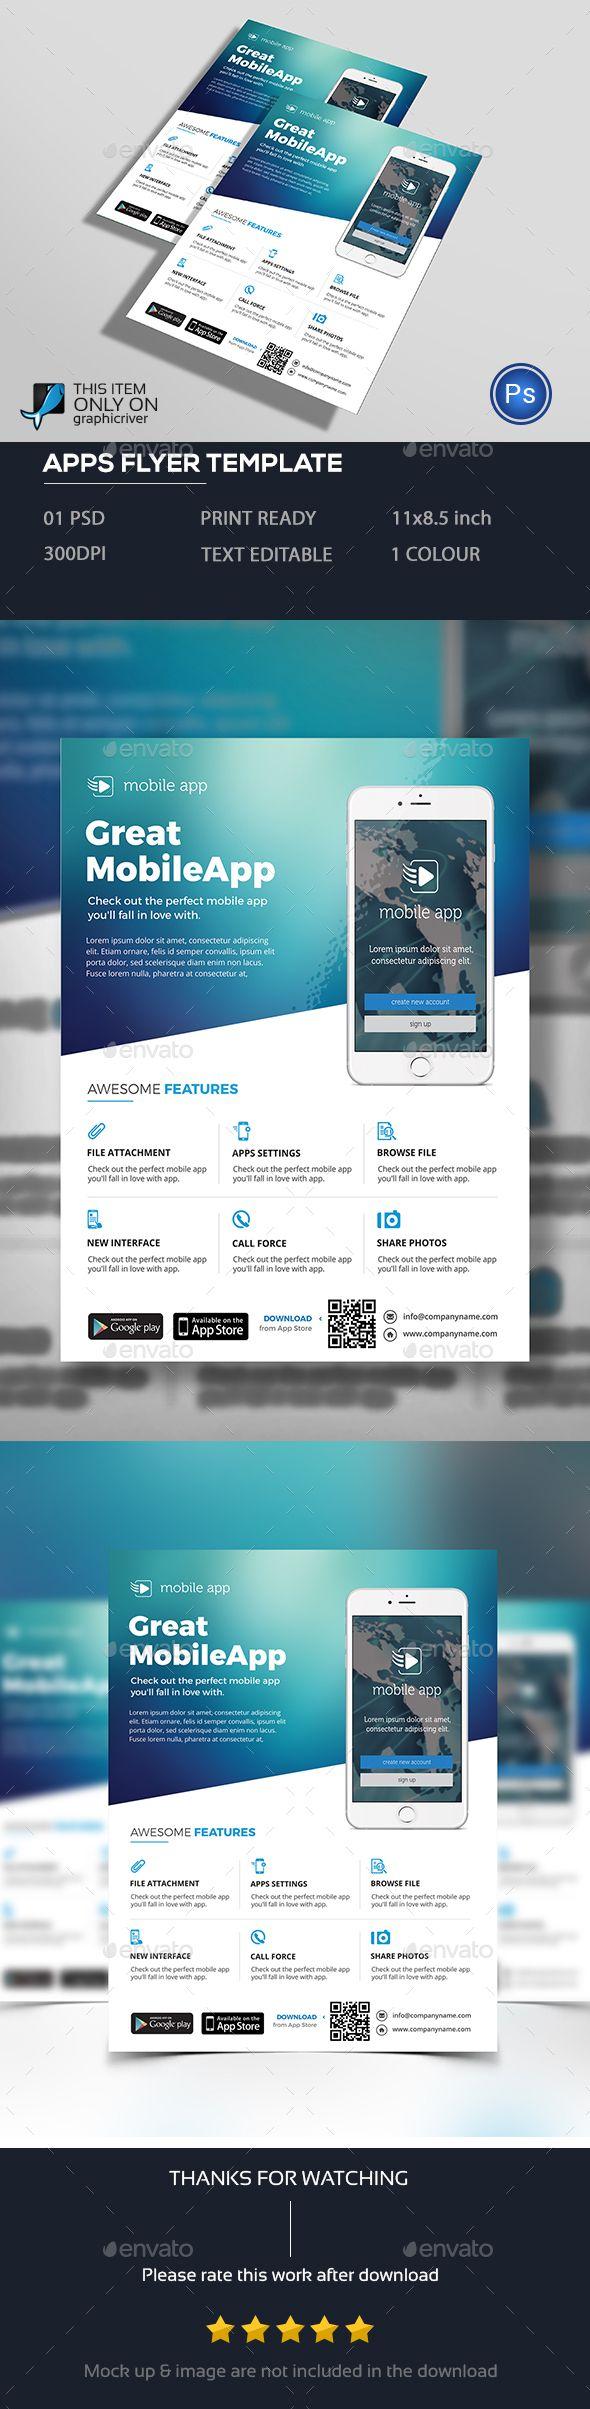 mobile apps flyer